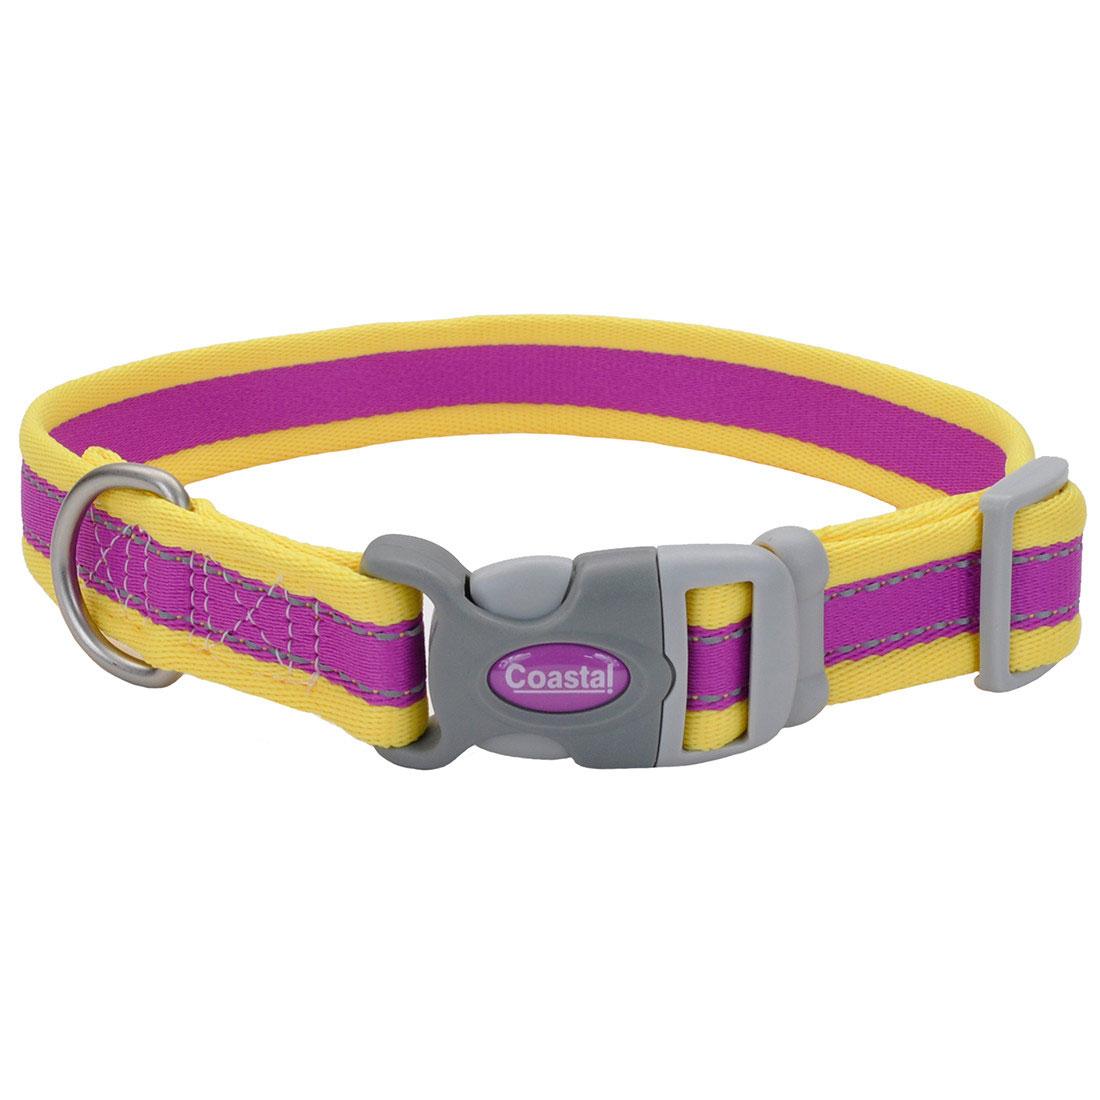 Coastal Pro Reflective Adjustable Dog Collar, Purple/Yellow, 1-in x 20-in